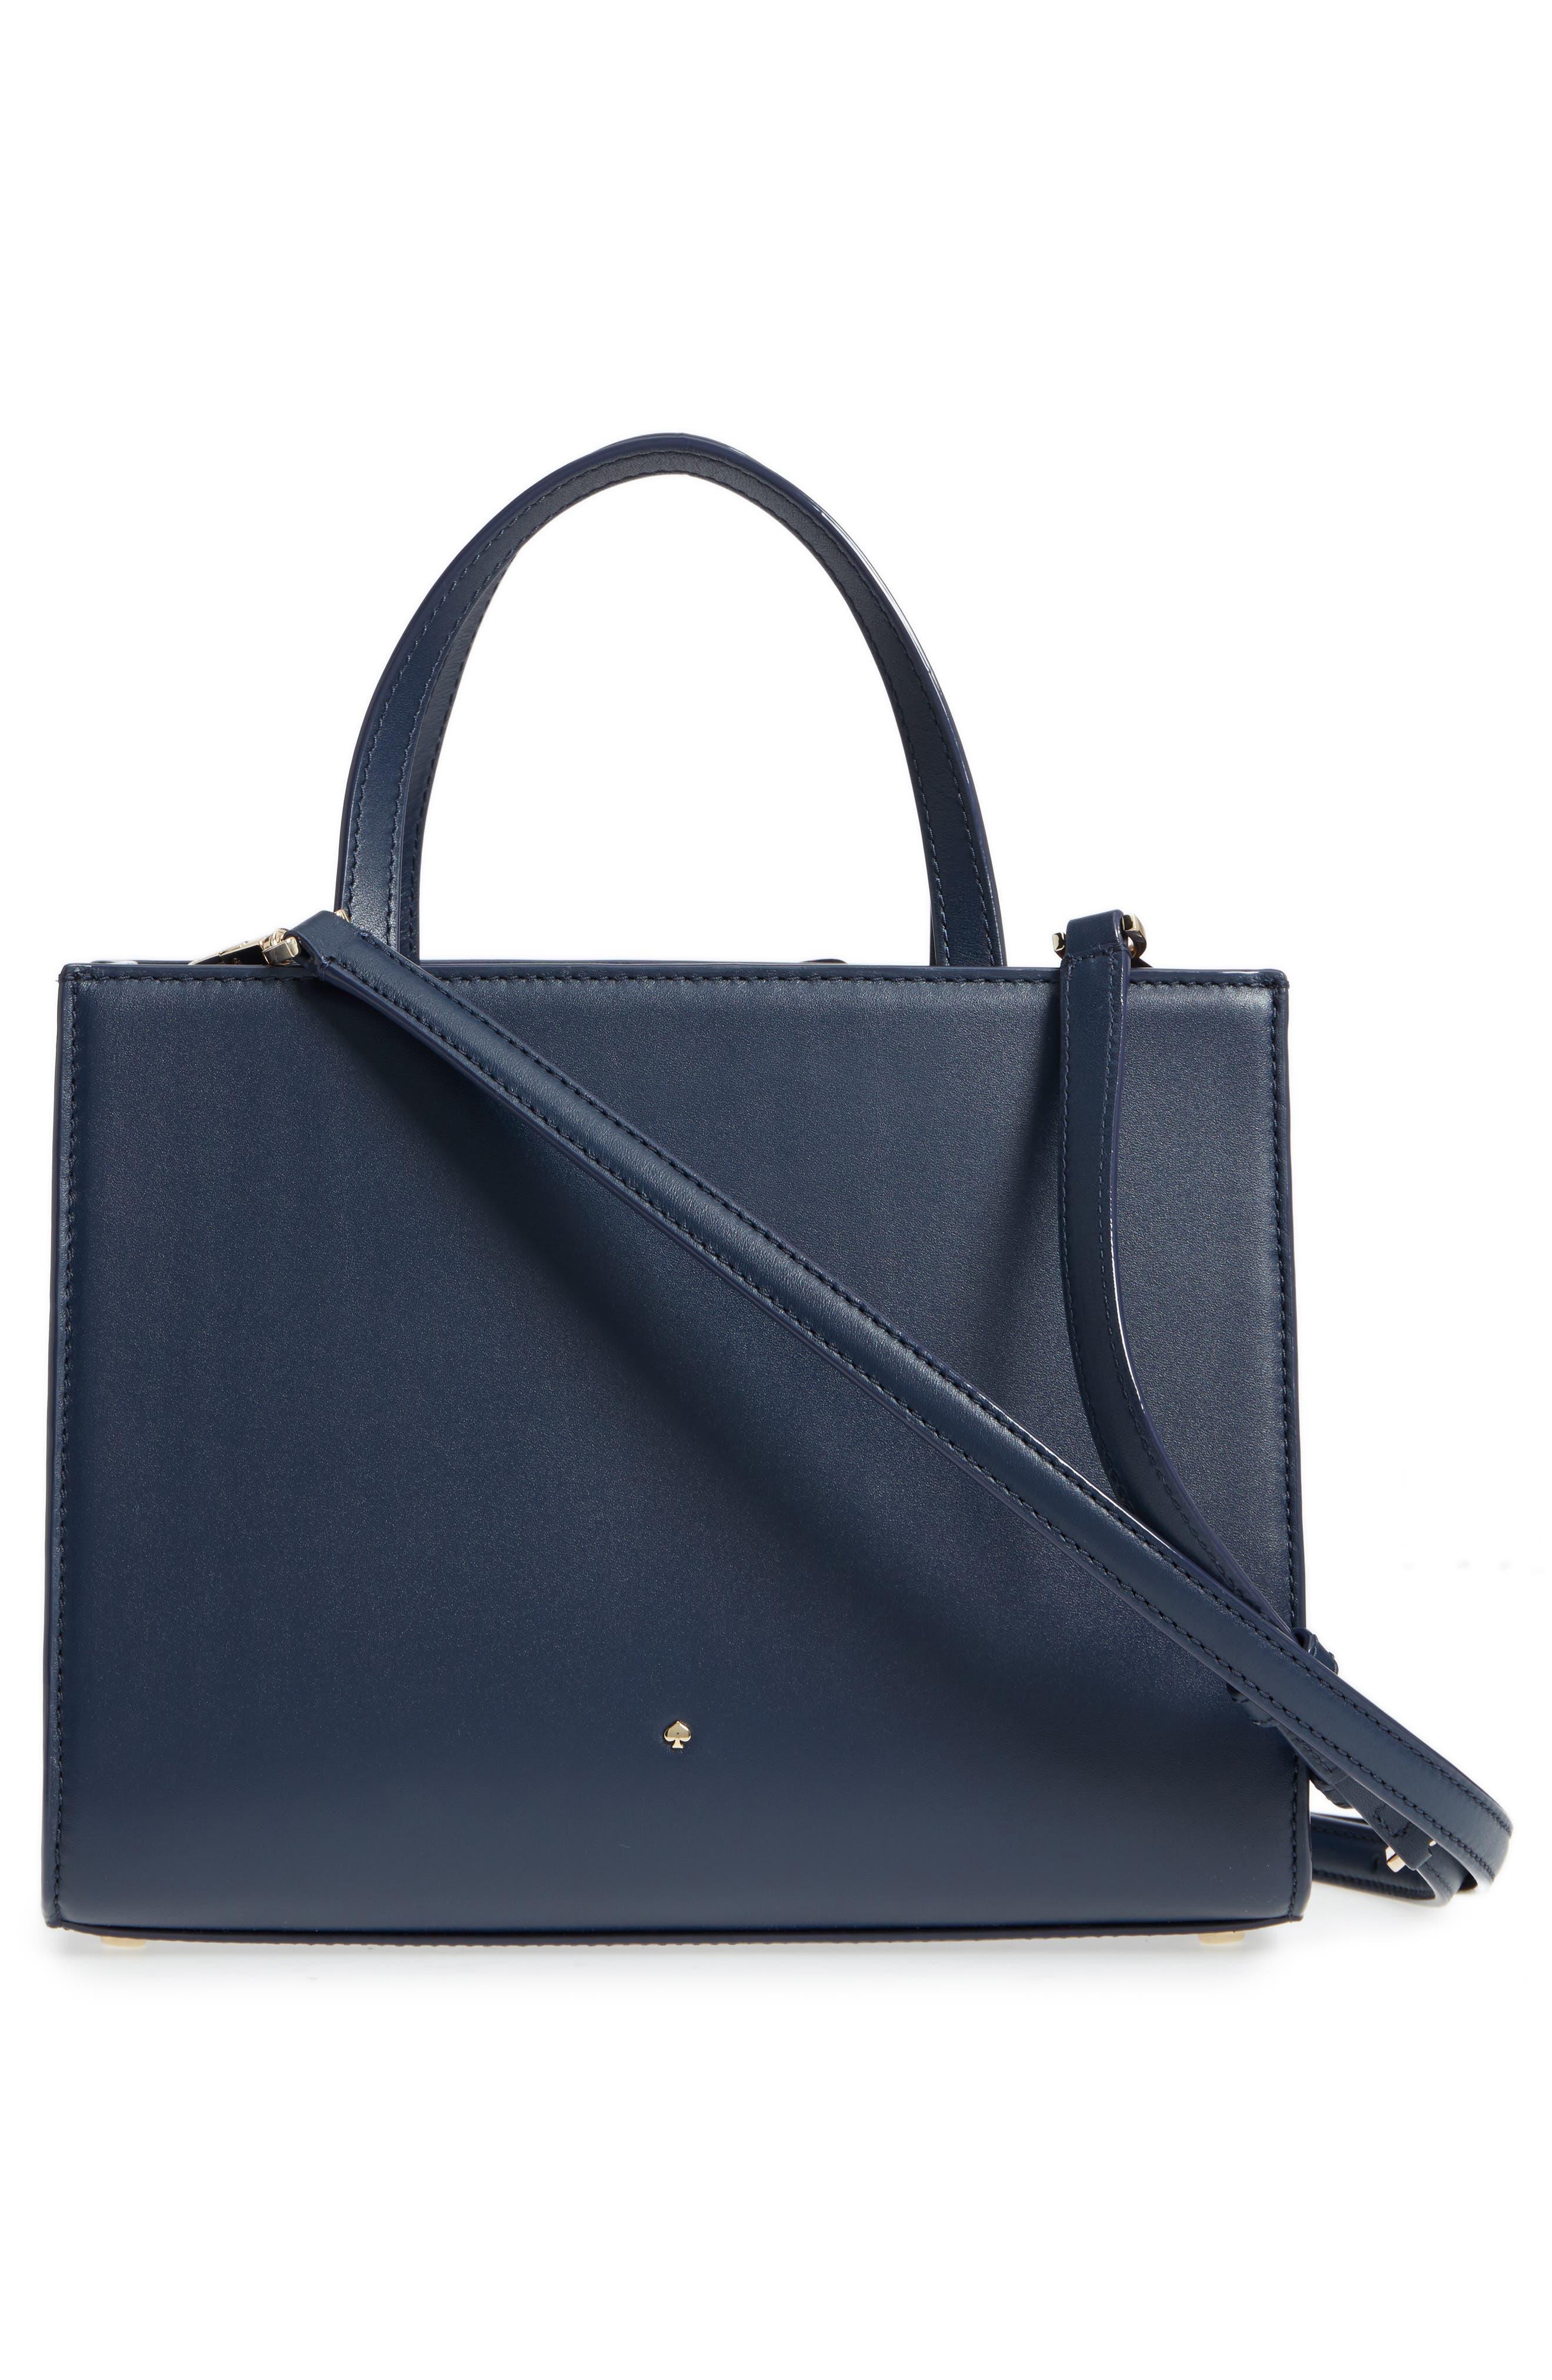 madison daisy lane – sam leather handbag,                             Alternate thumbnail 3, color,                             400